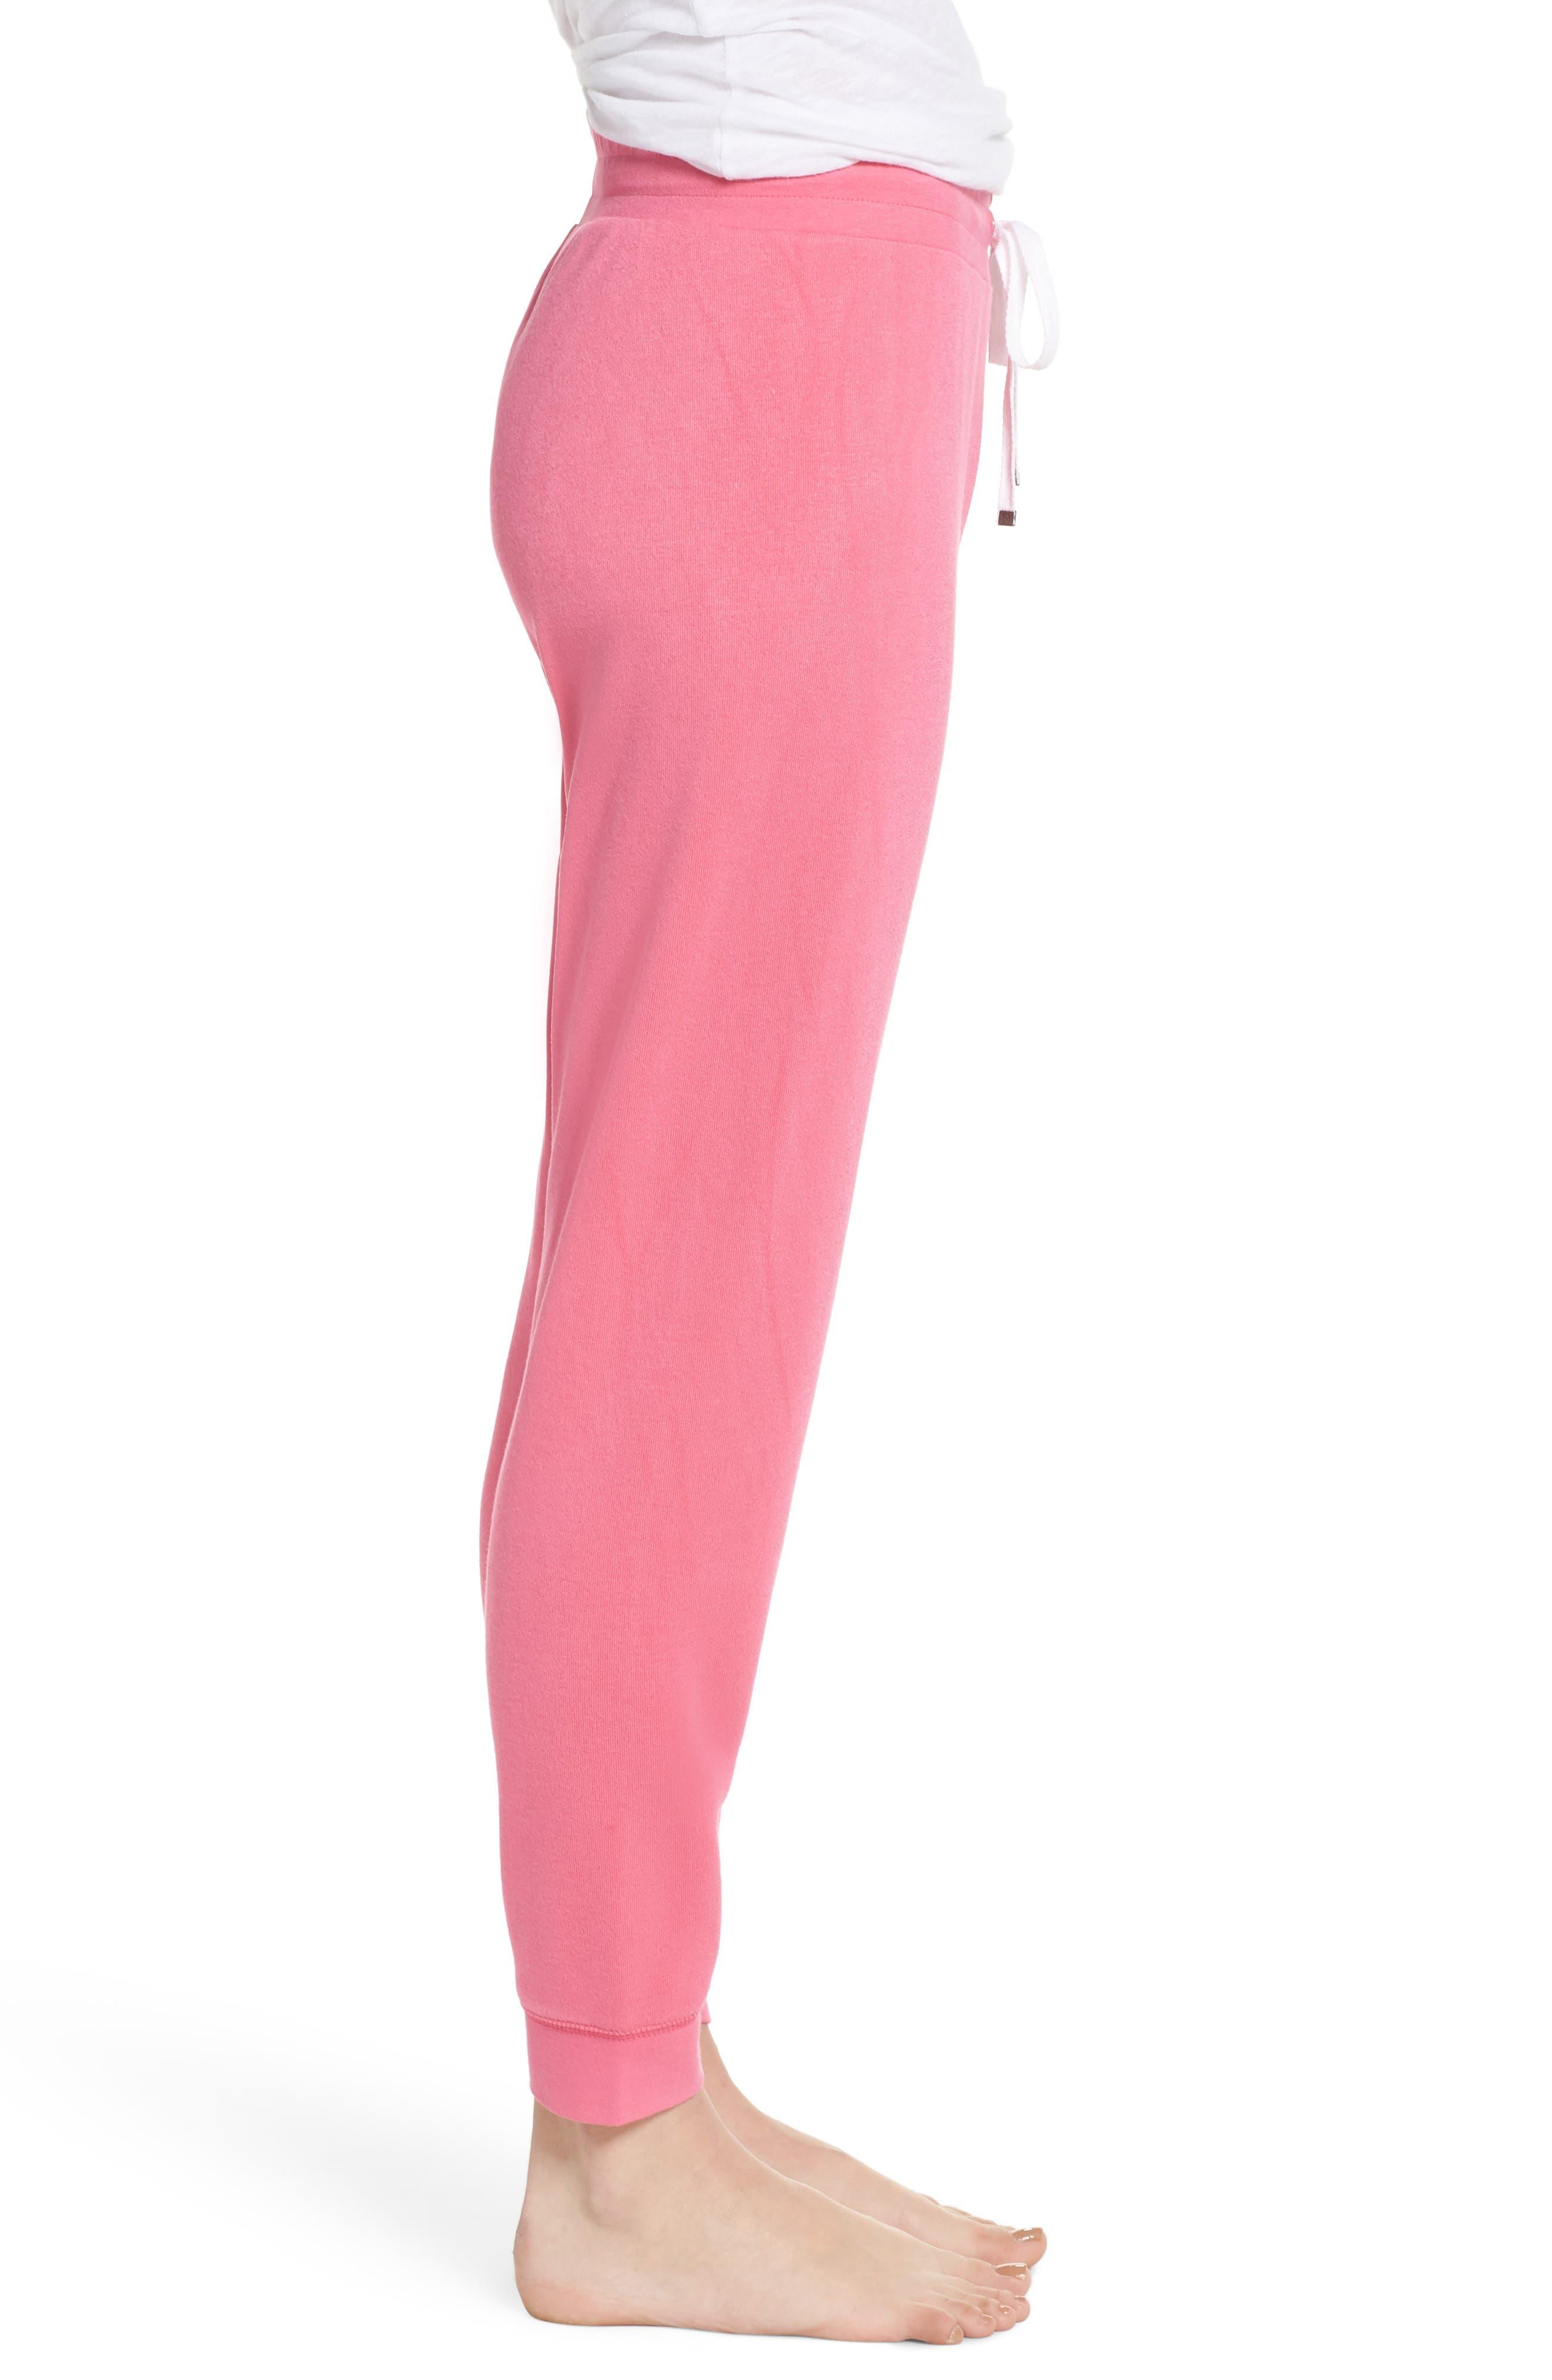 Firecracker Jogger Pajama Pants,                             Alternate thumbnail 3, color,                             Pink Fandango